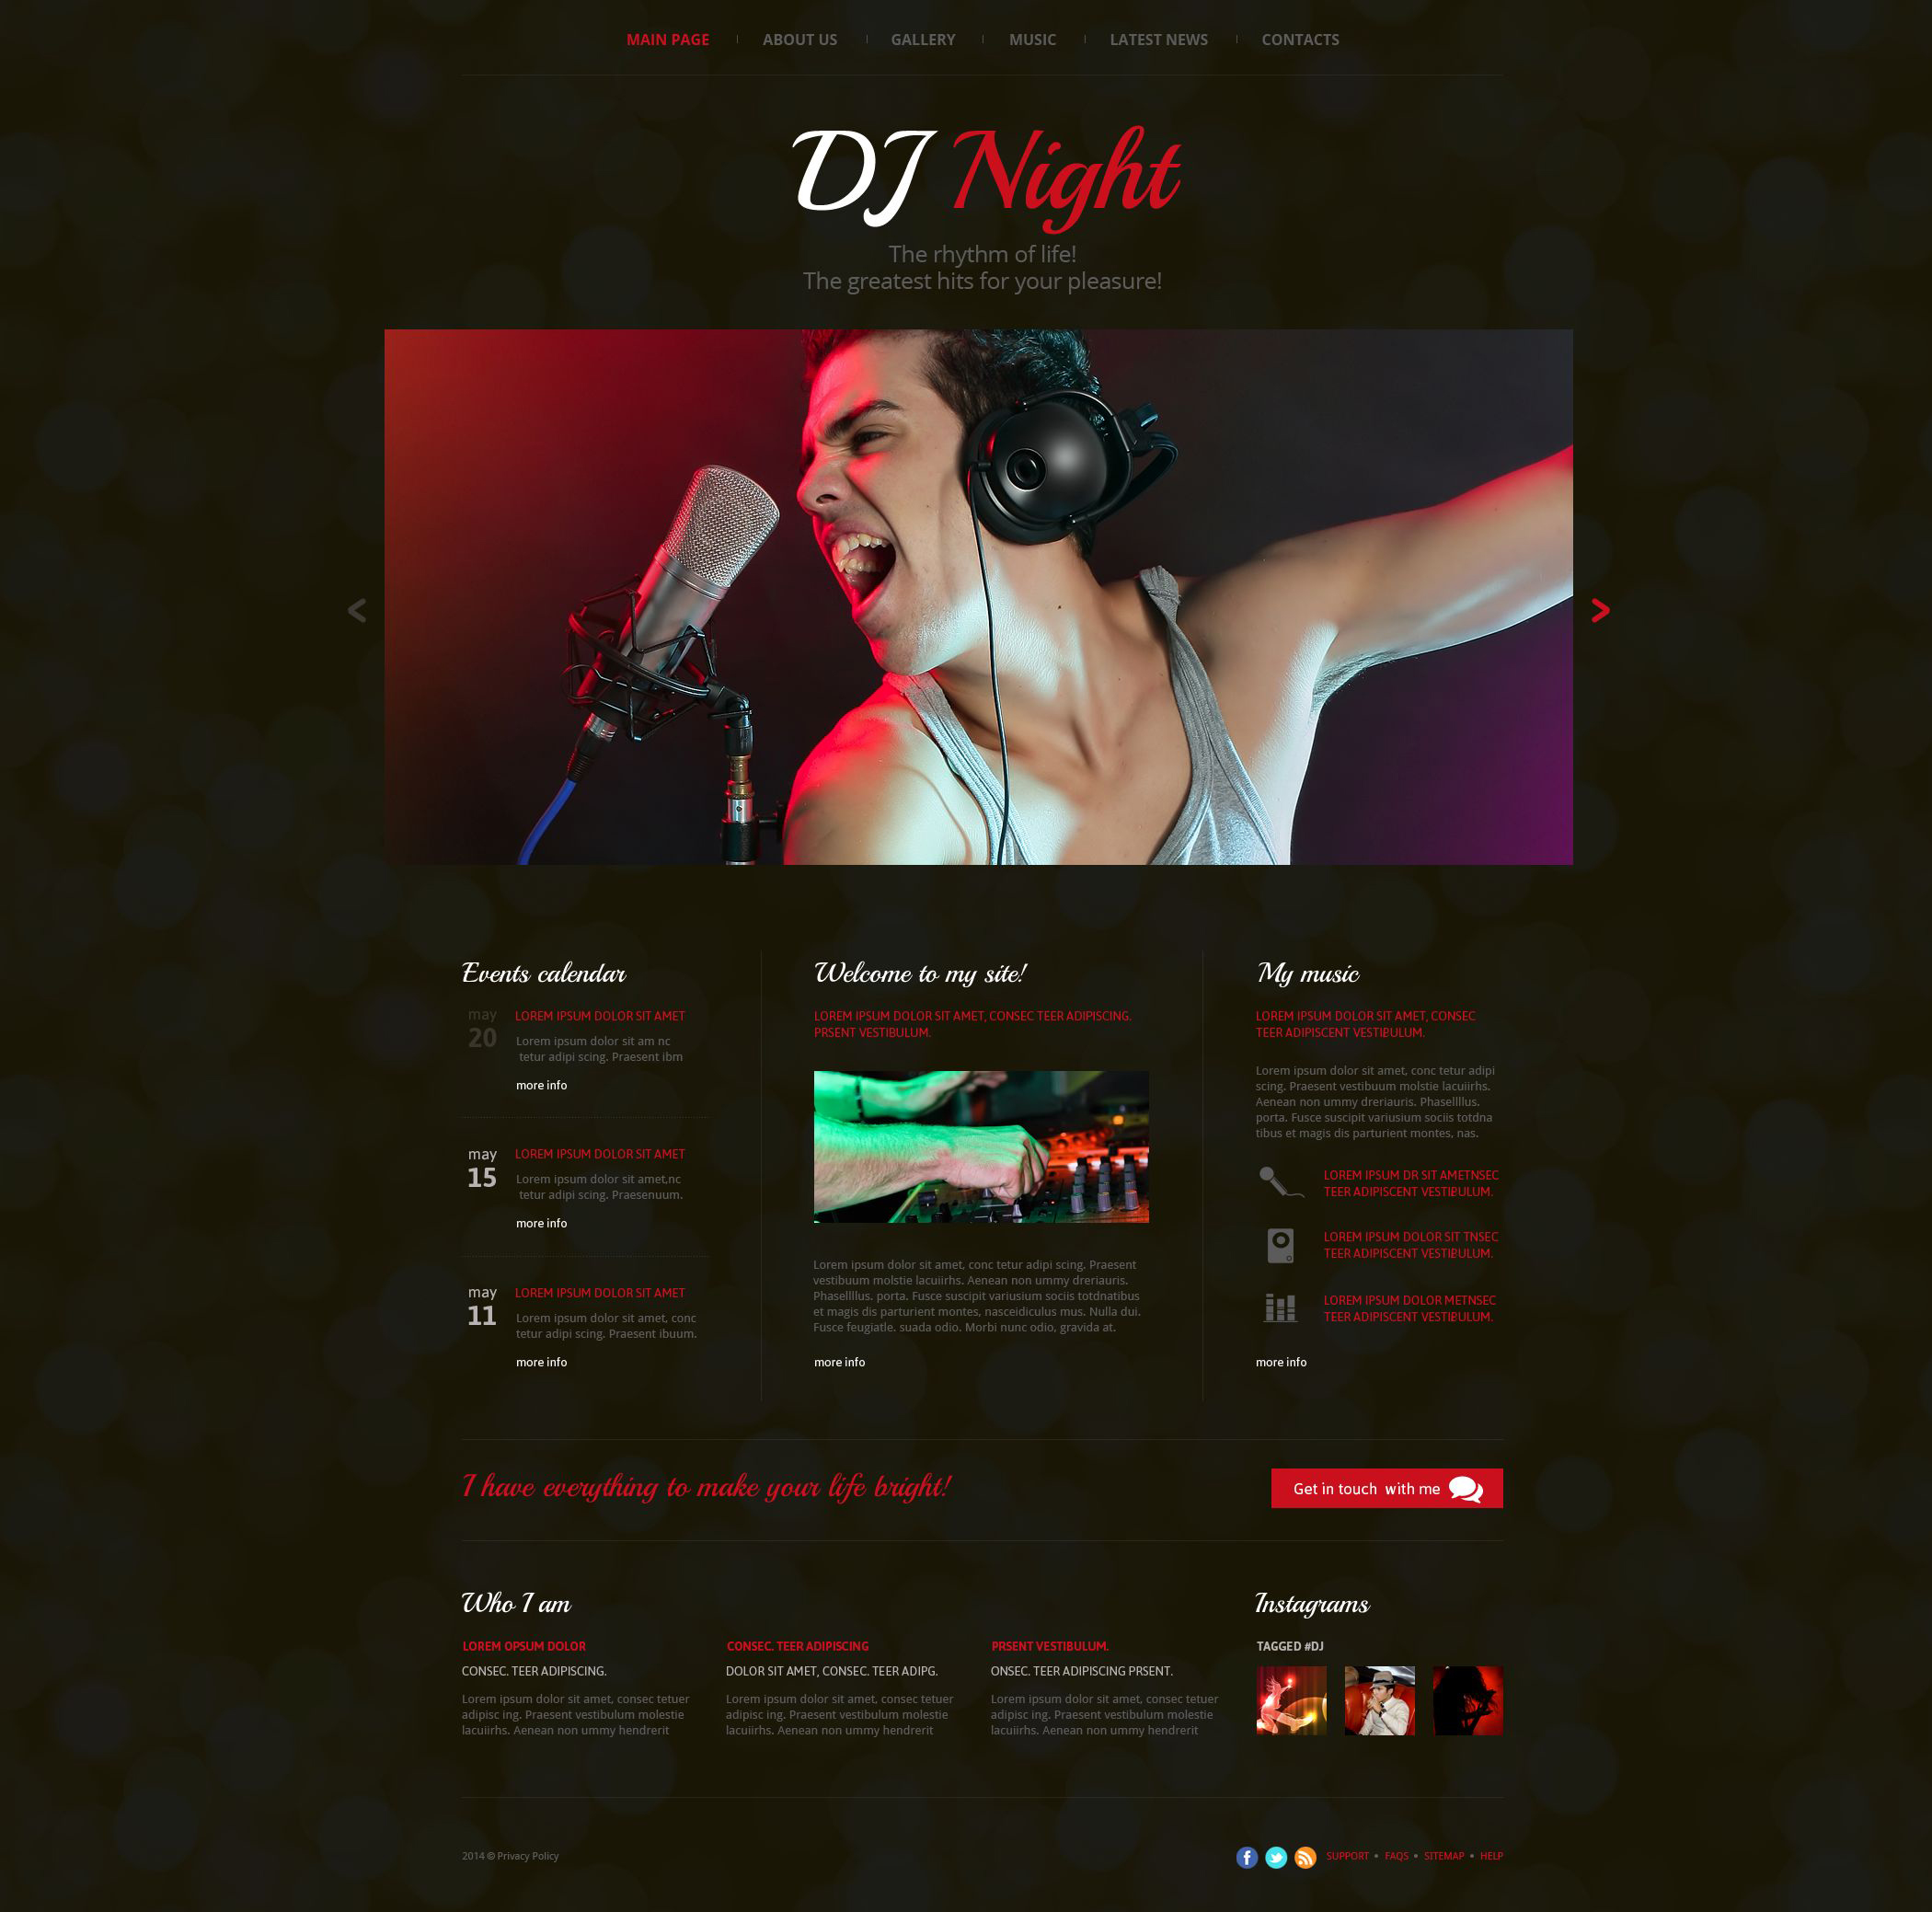 dj website templates - Selo.l-ink.co